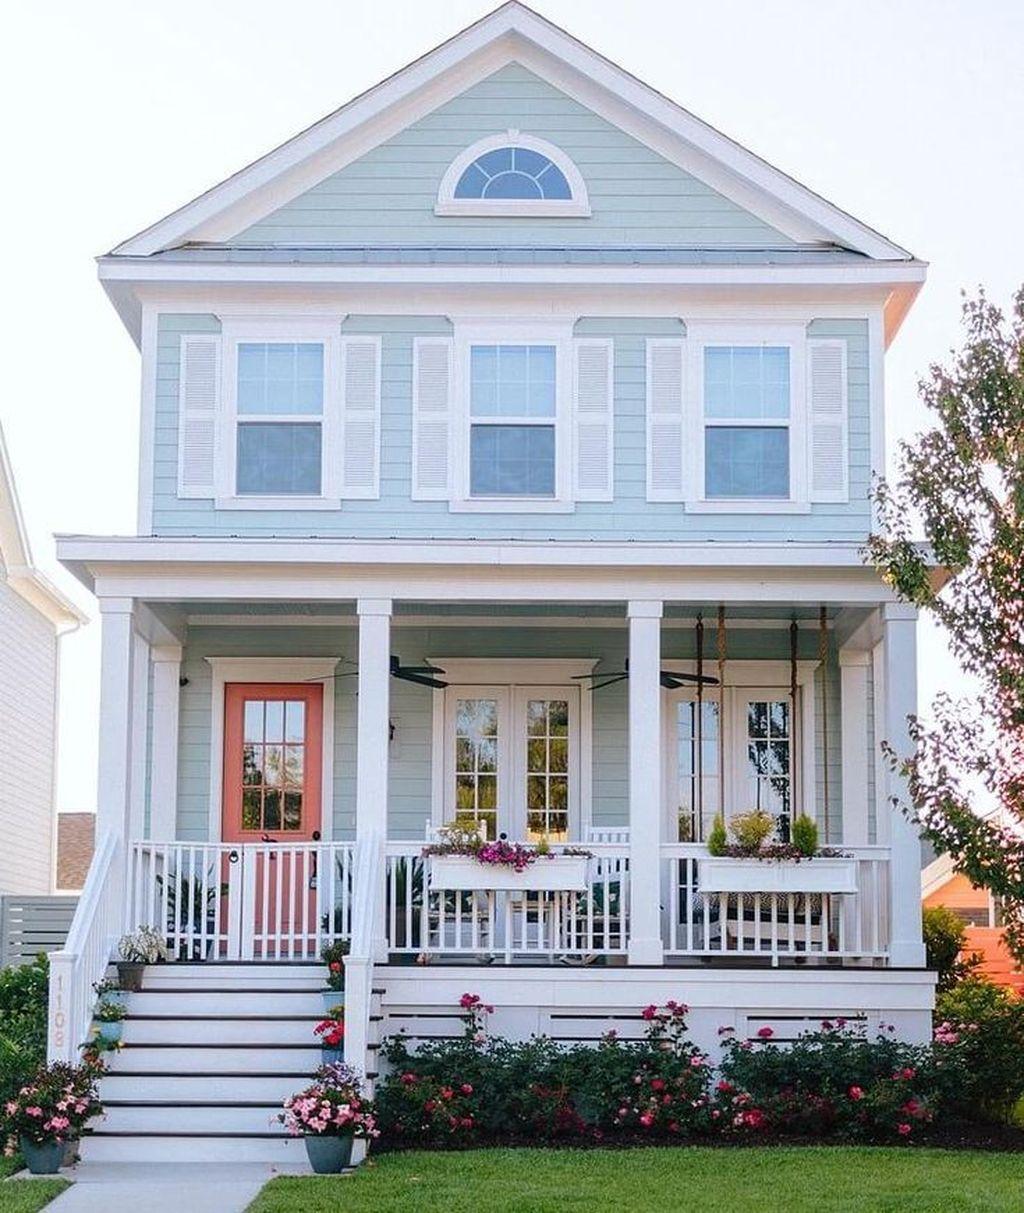 Admirable Beach House Exterior Design Ideas You Will Love 26